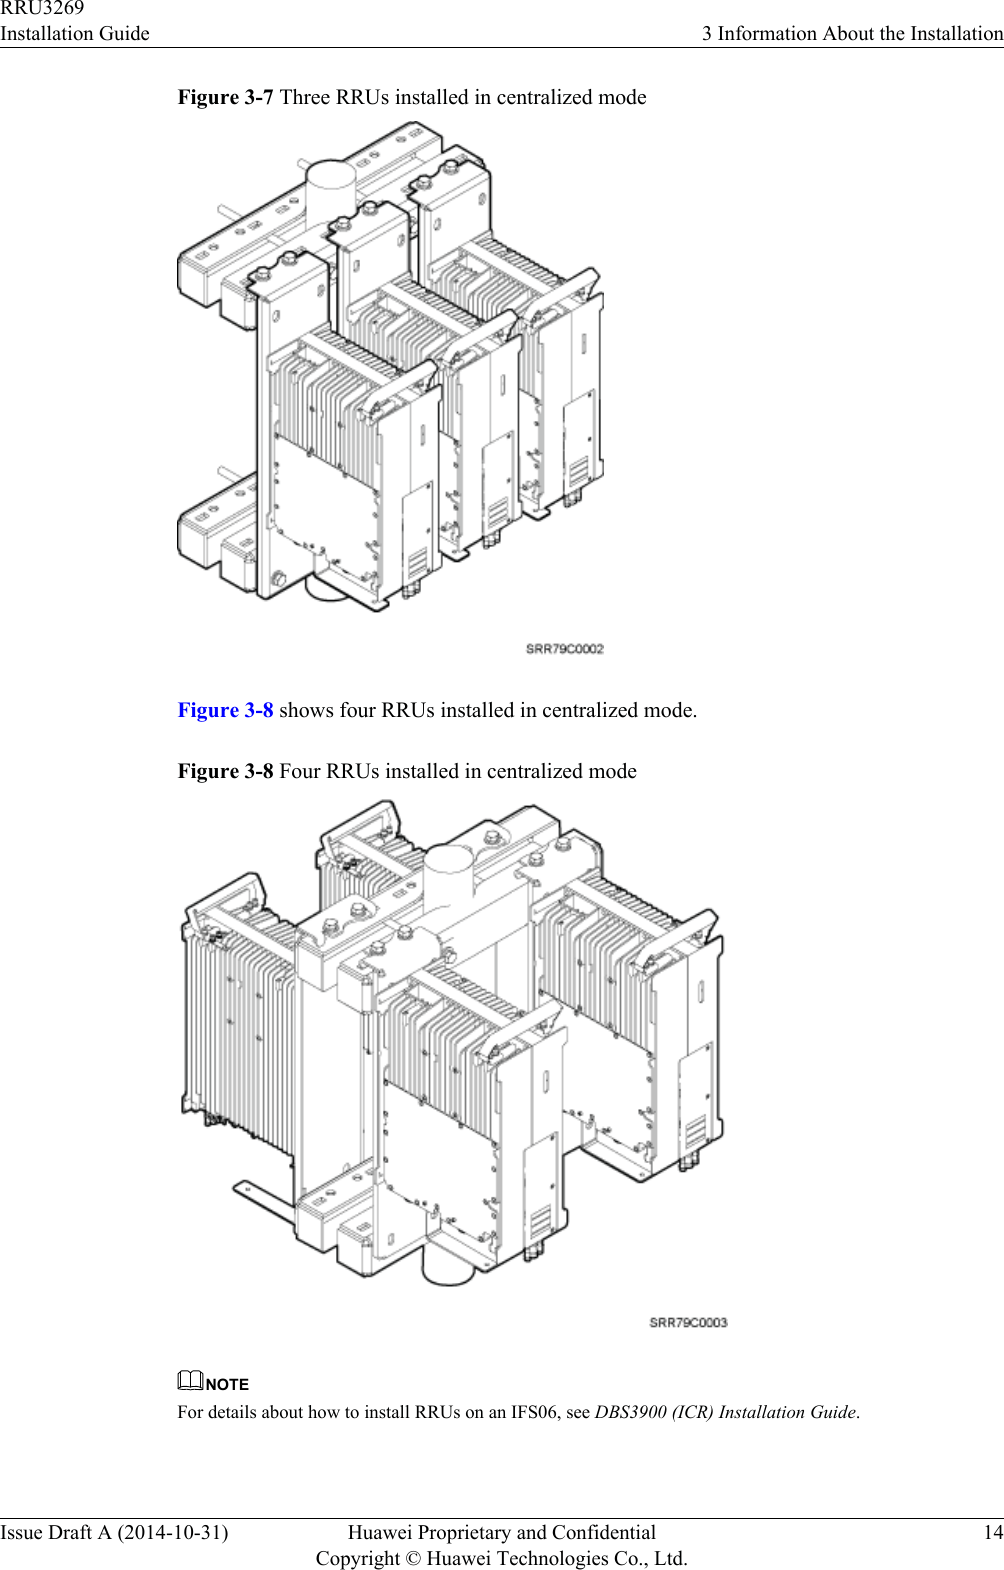 Huawei Technologies RRU3269 Remote Radio Unit User Manual